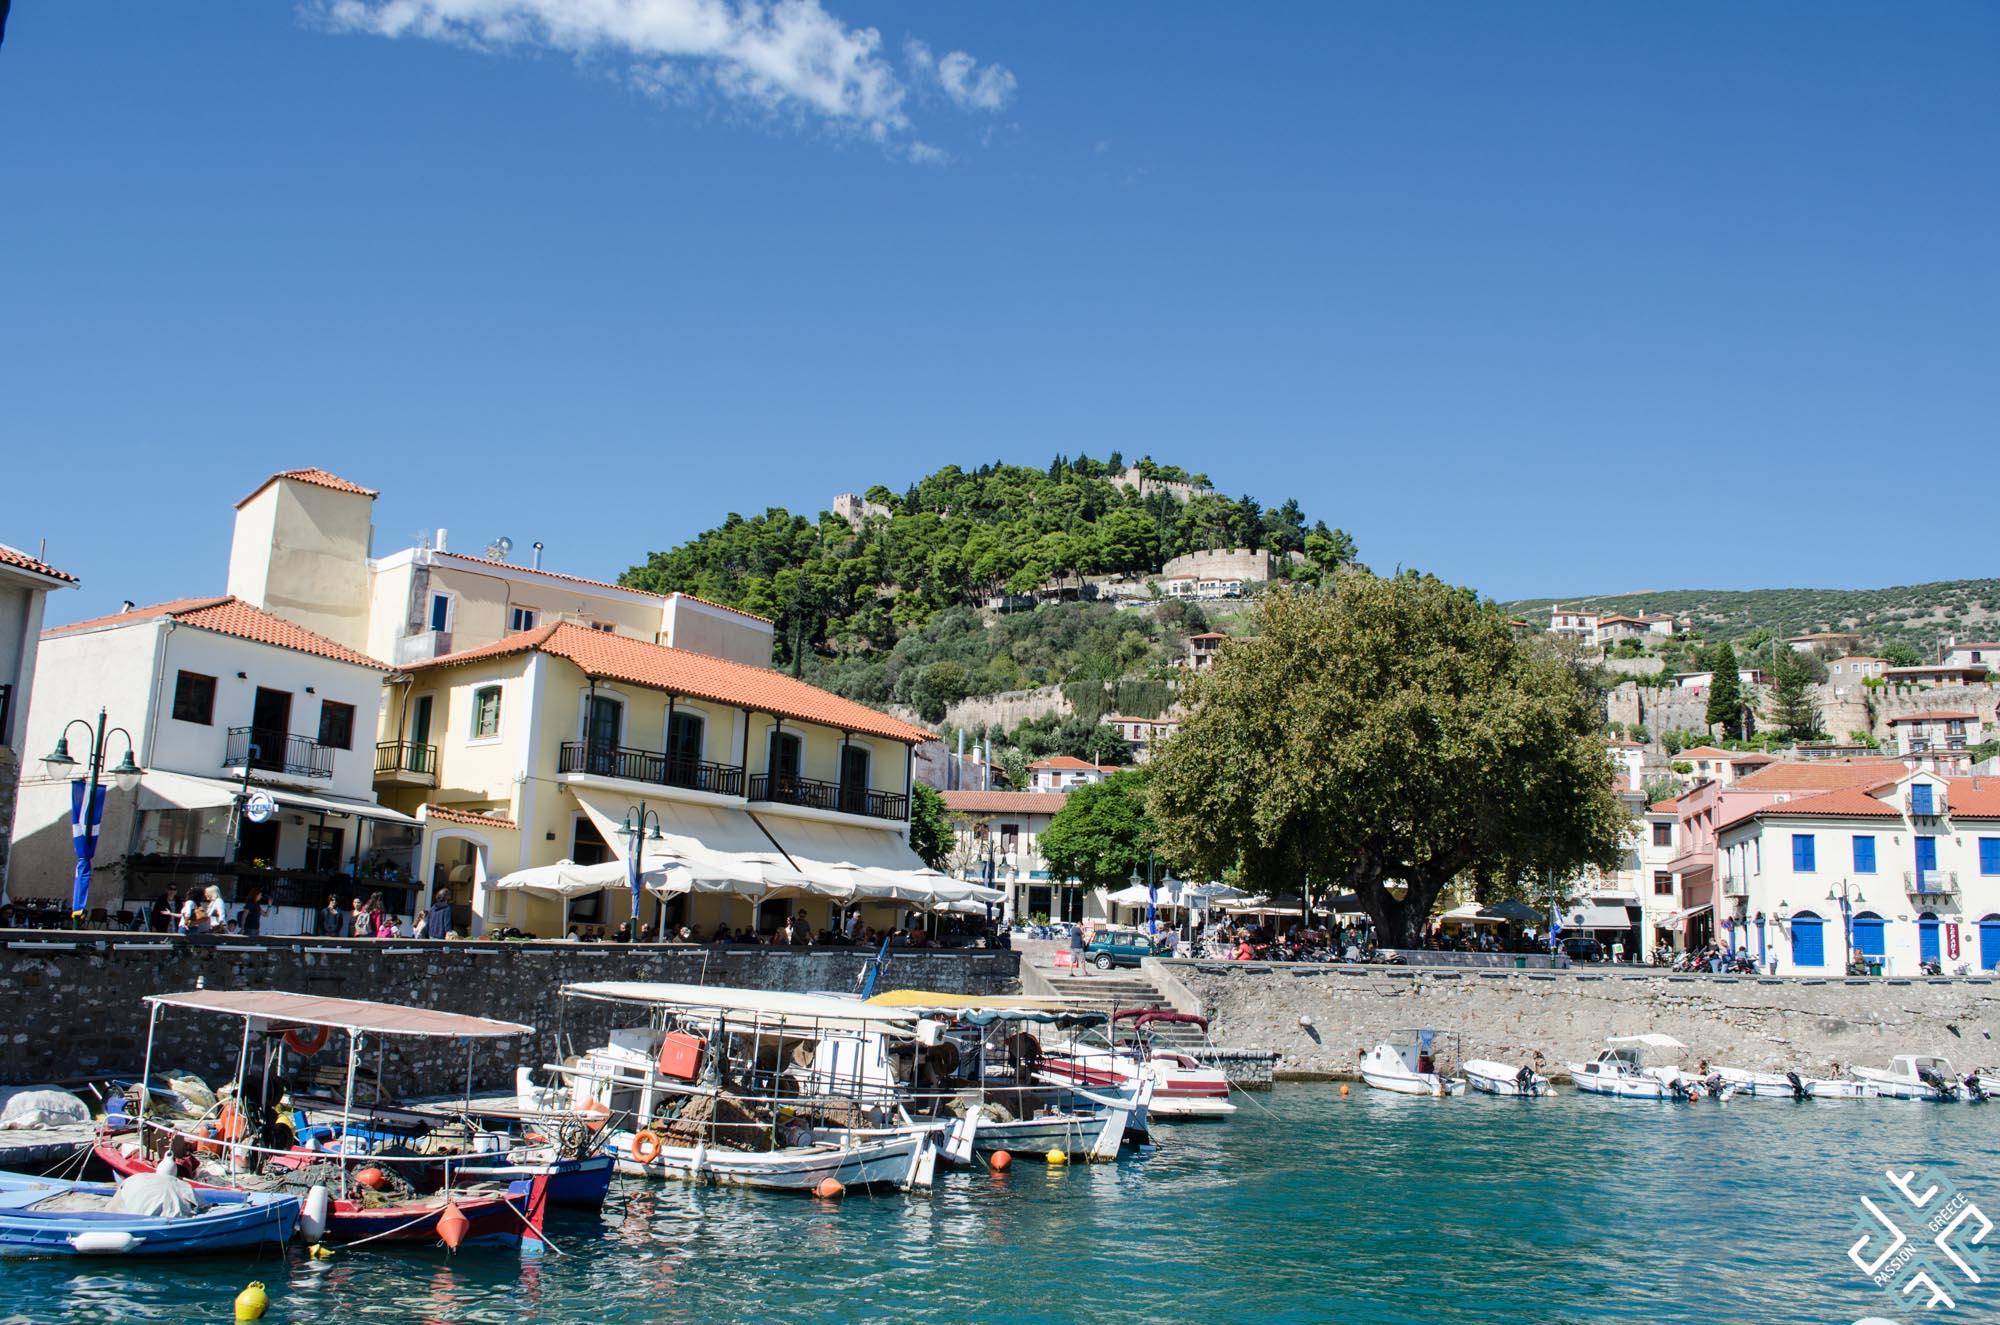 nafpaktos-harbour-and-castle-view-1